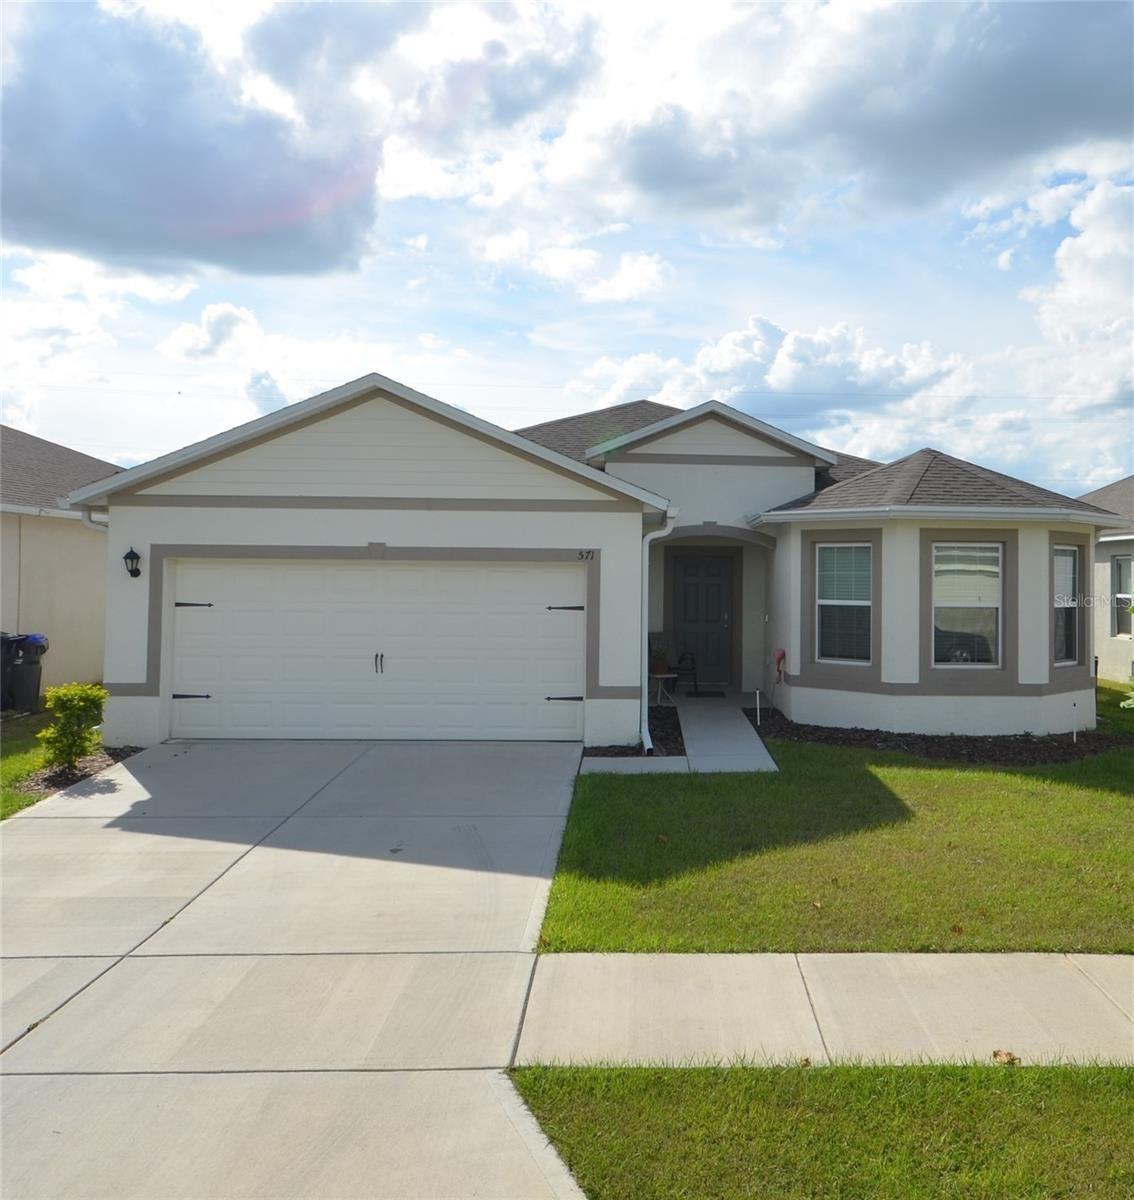 571 AUTUMN STREAM DRIVE, Auburndale, FL 33823 - #: P4917753